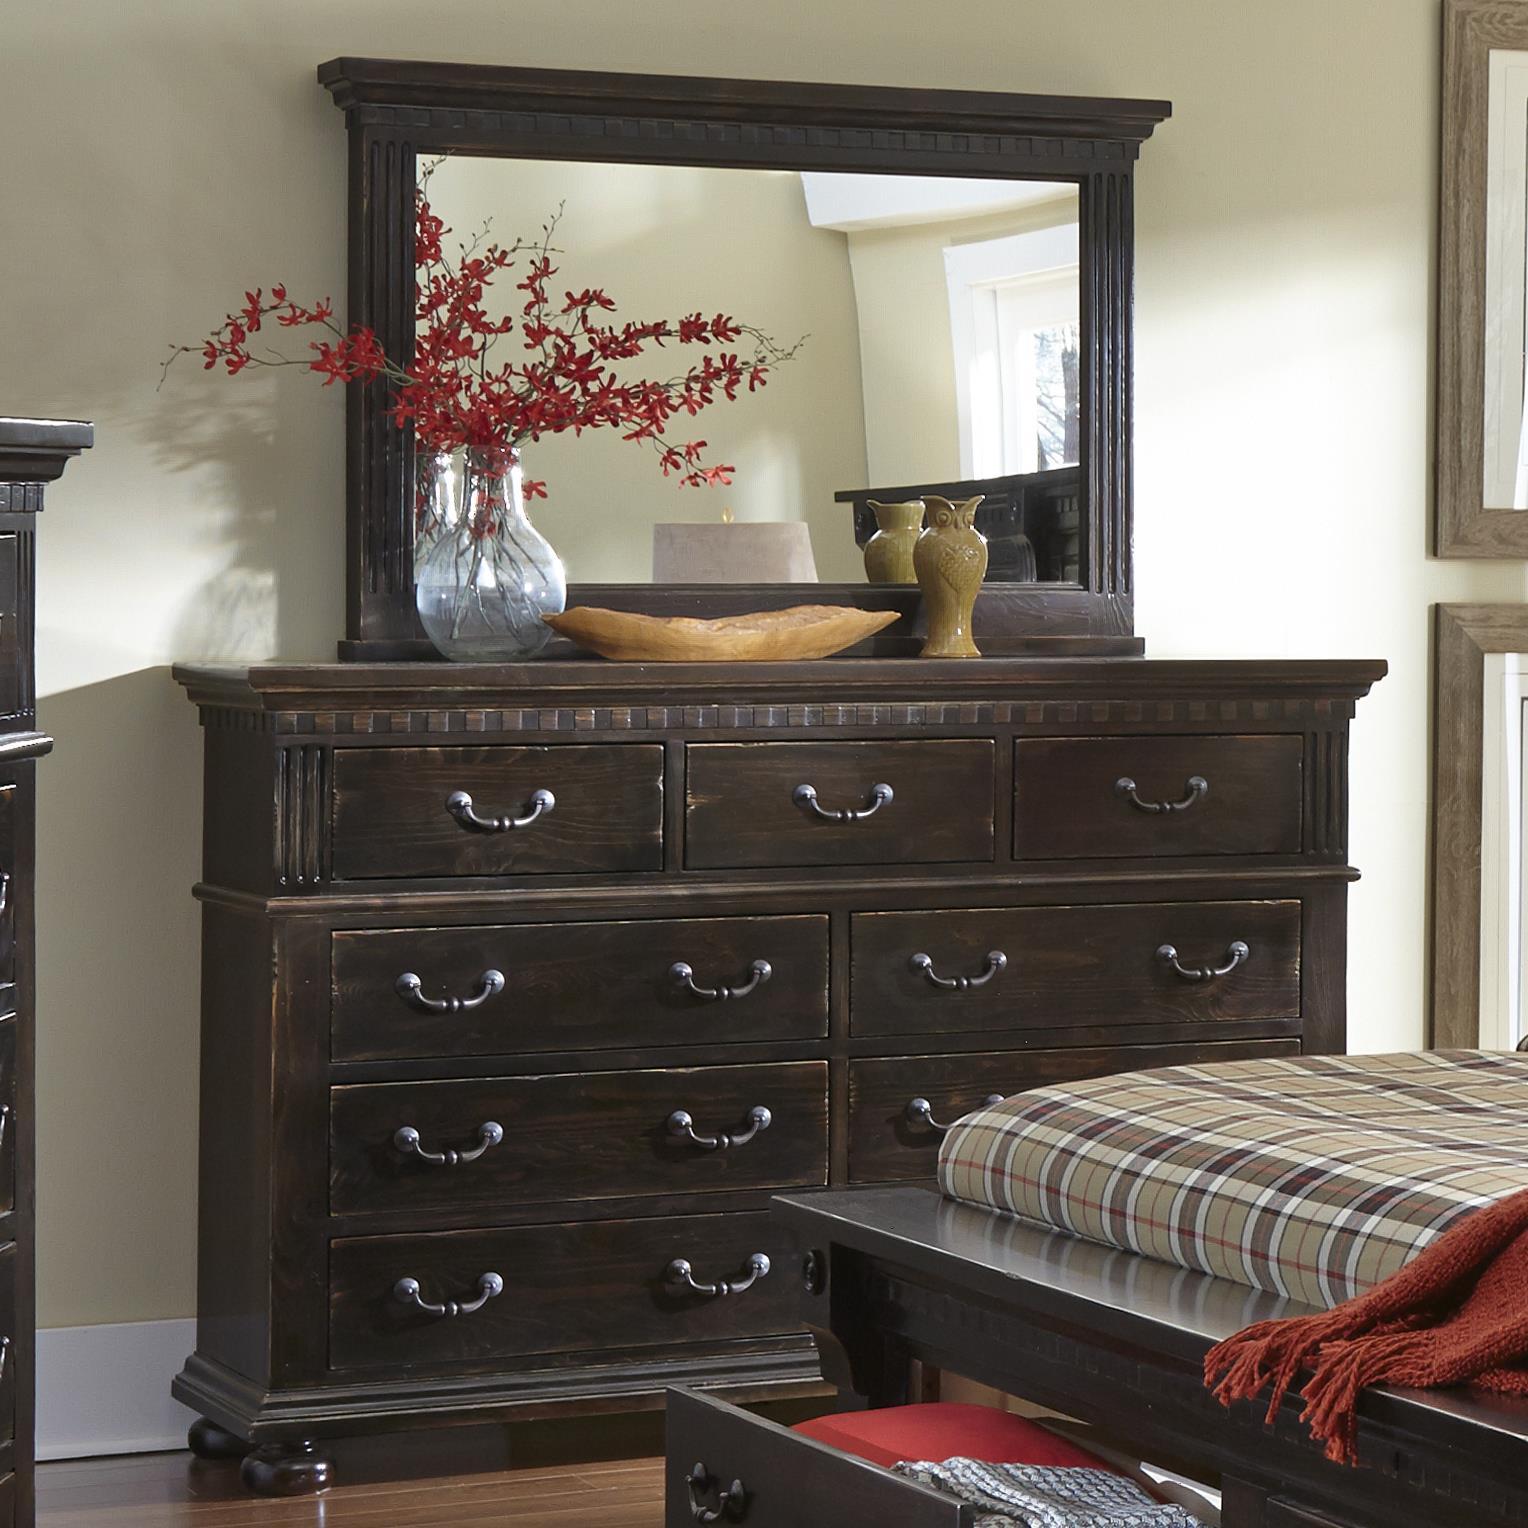 Progressive Furniture La Cantera Drawer Dresser & Mirror - Item Number: P665-23+50